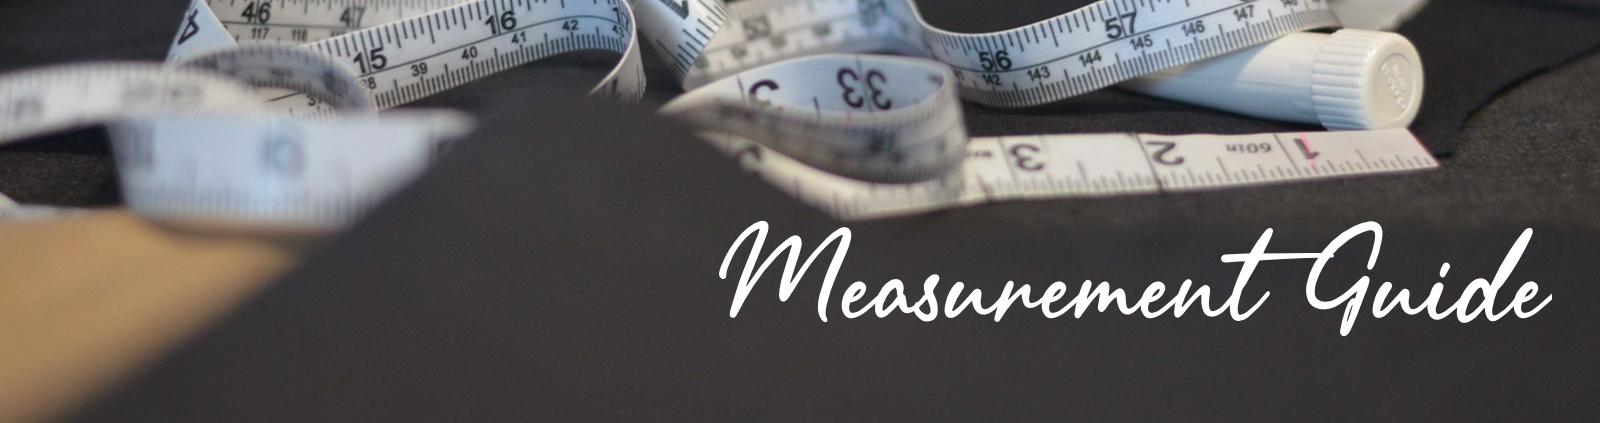 measurement-guide-link-photo.jpg